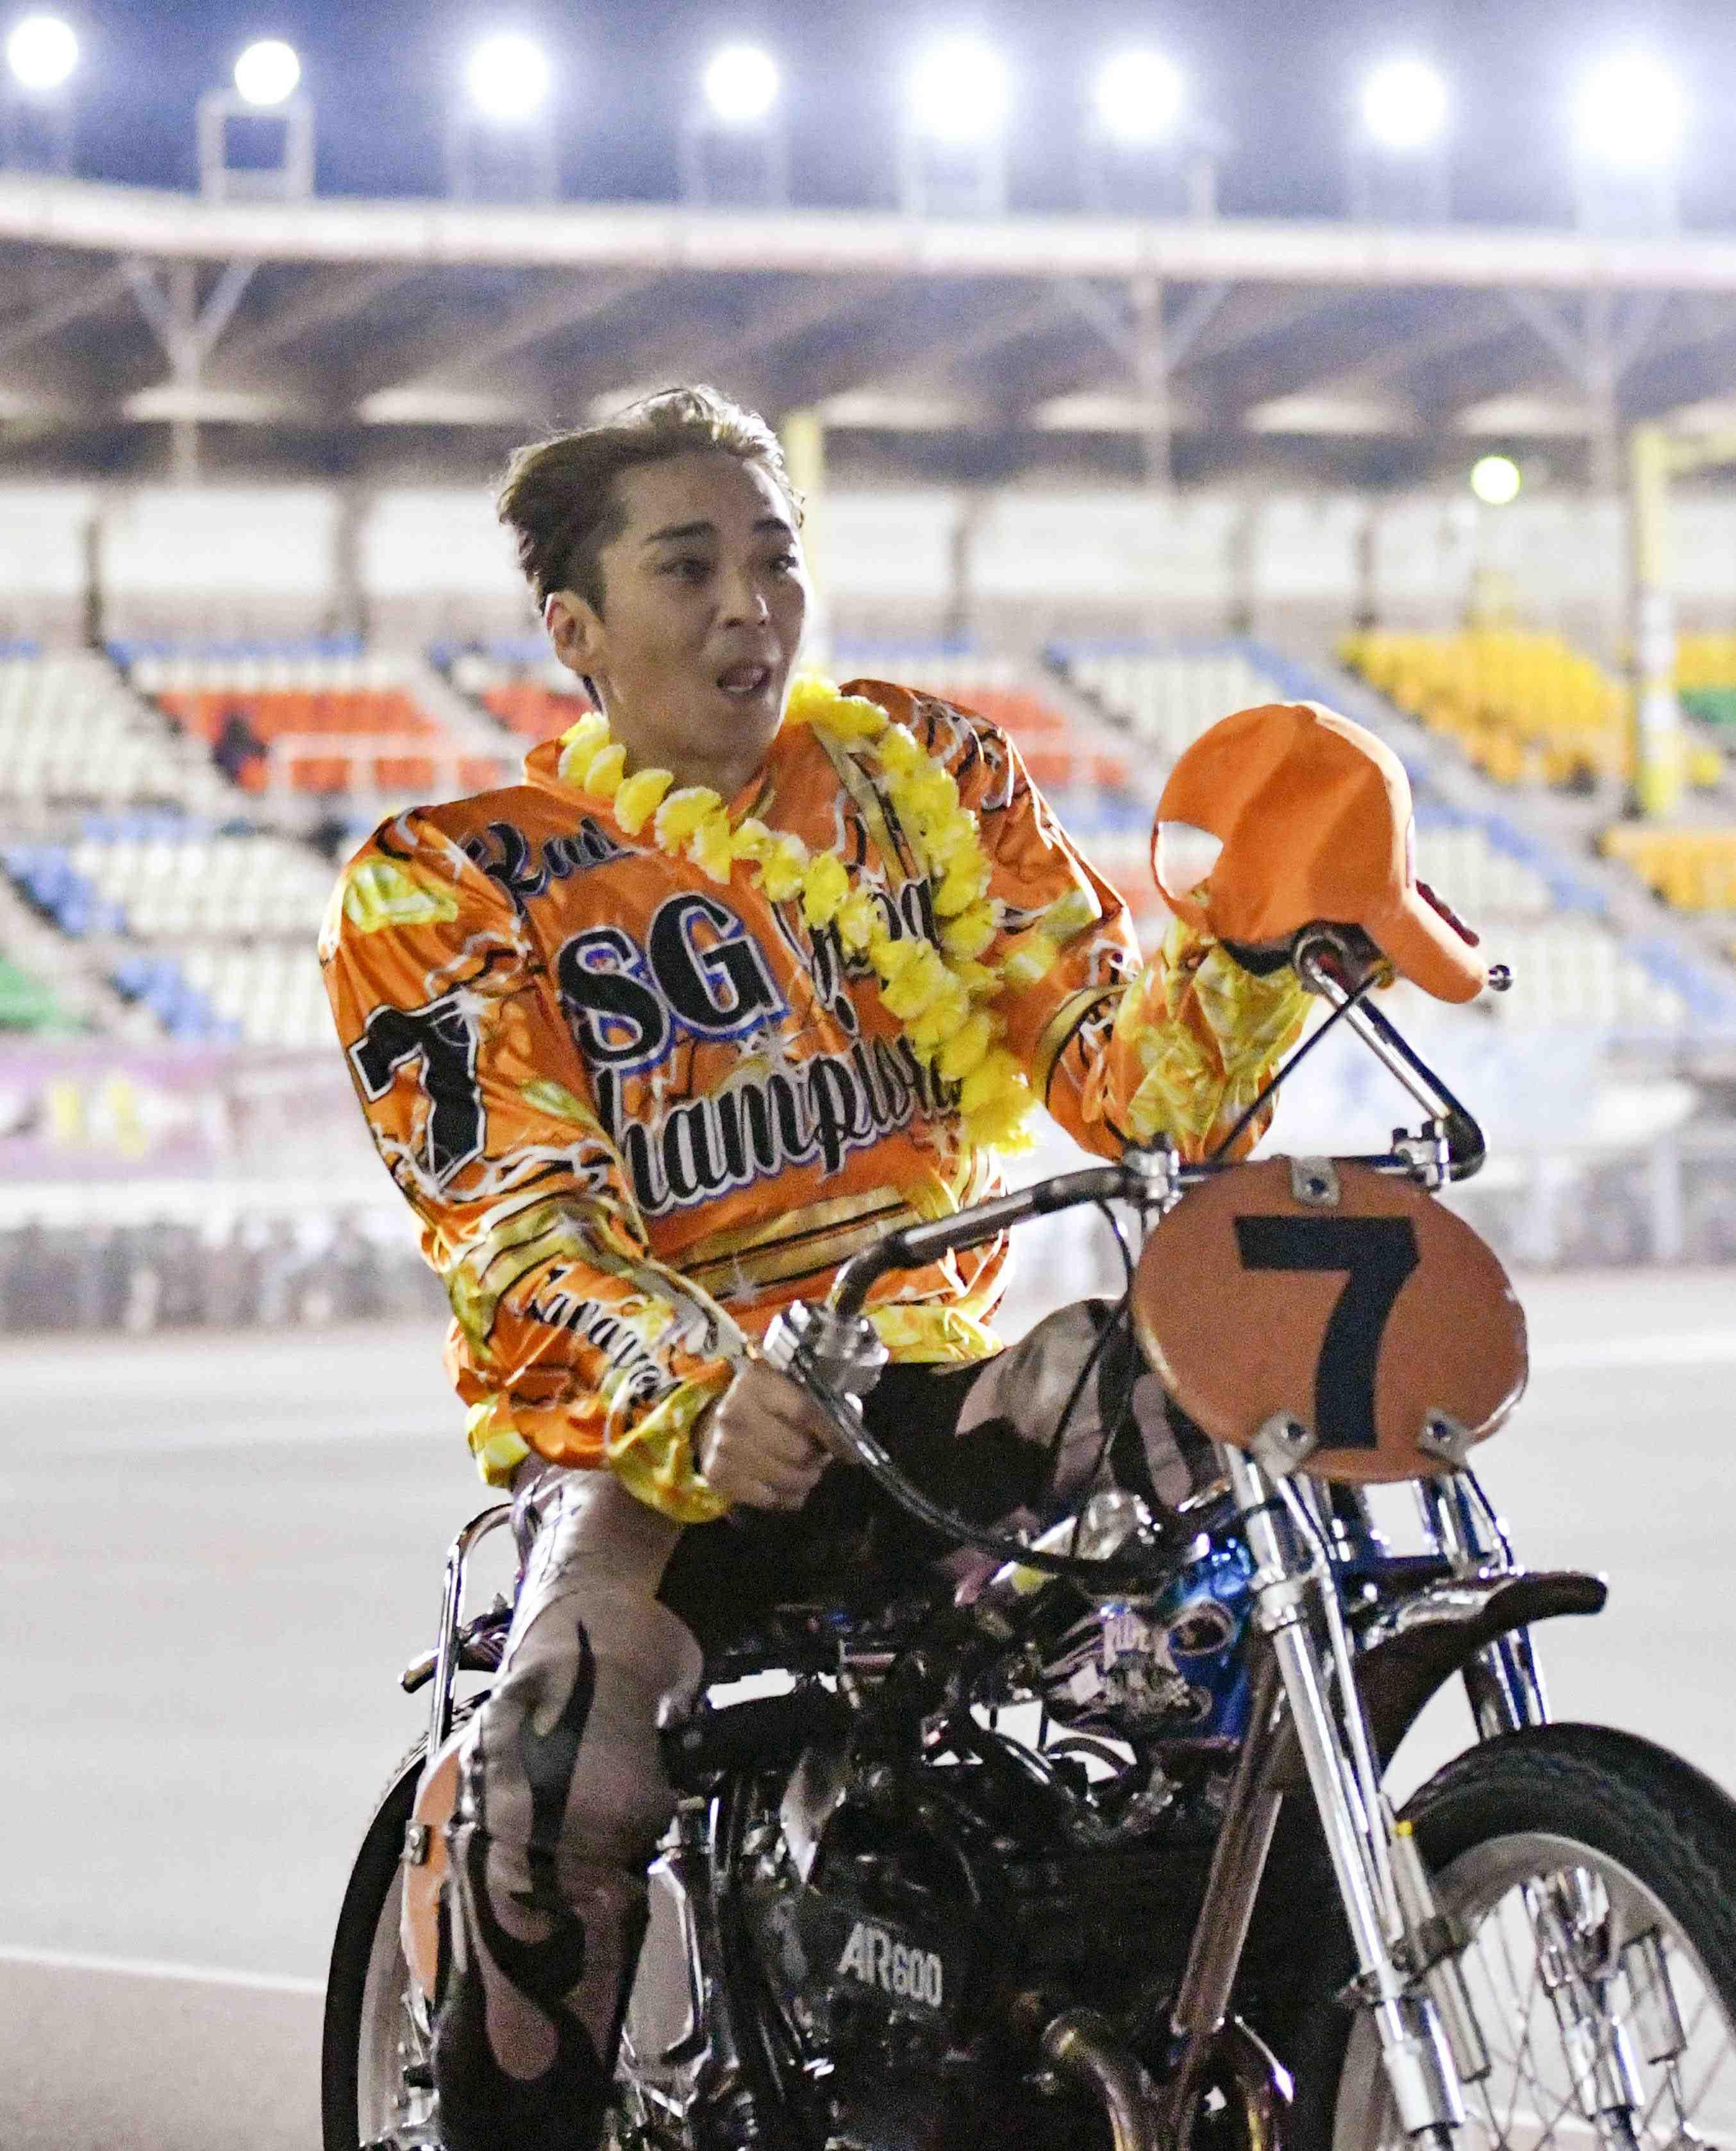 Former SMAP member Katsuyuki Mori triumphed in the national championship in auto race 009